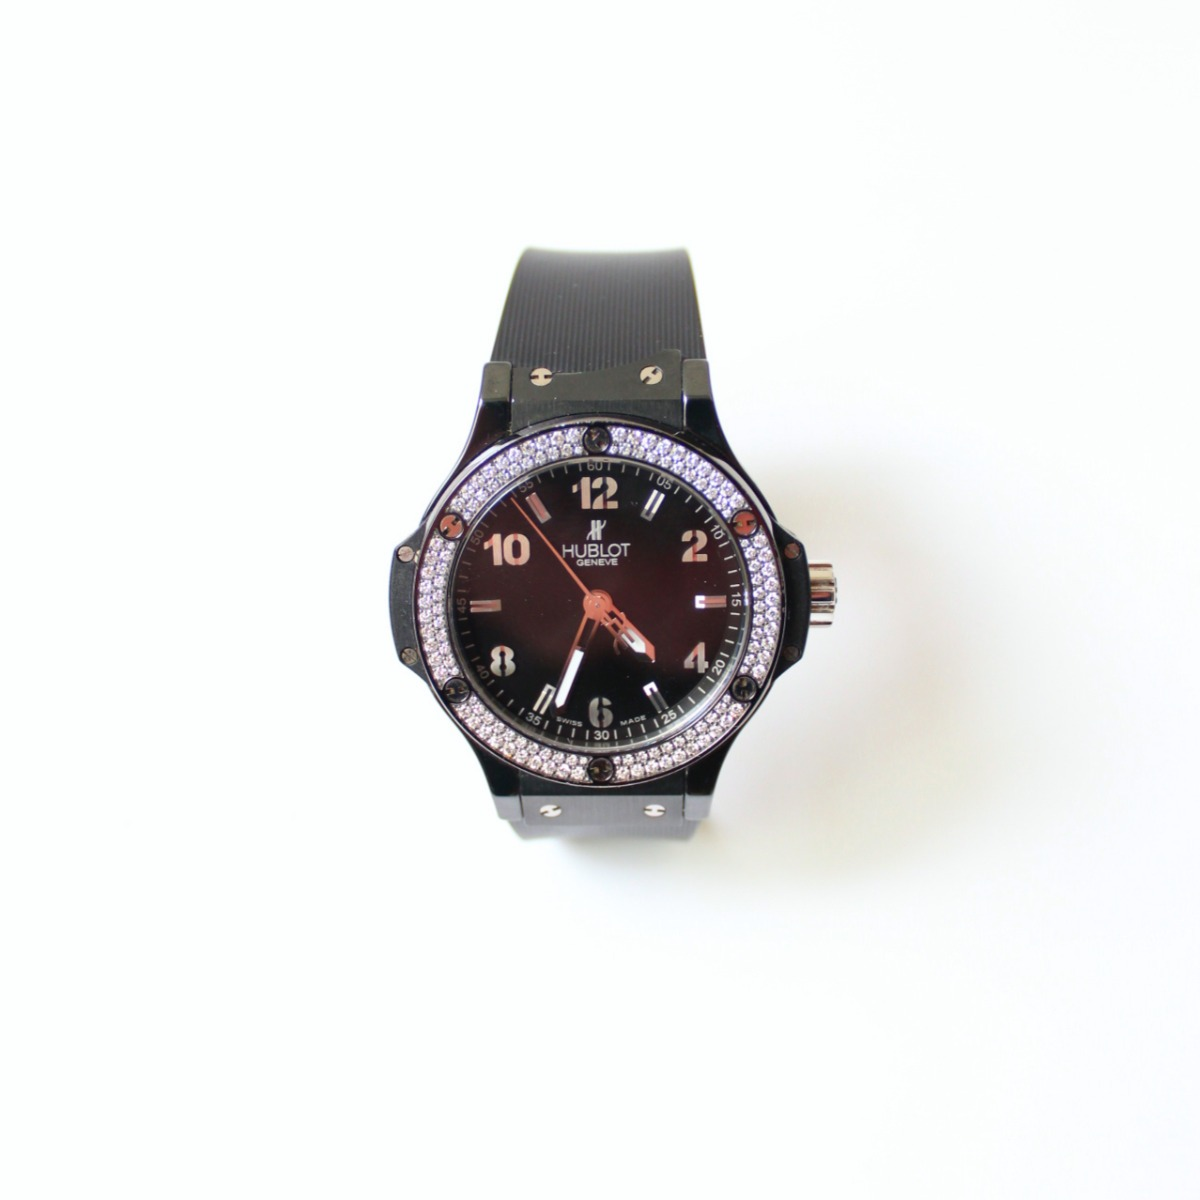 9d207ca35901 Reloj Hublot Big Bang Negro Con Diamantes -   6.900.000 en Mercado Libre